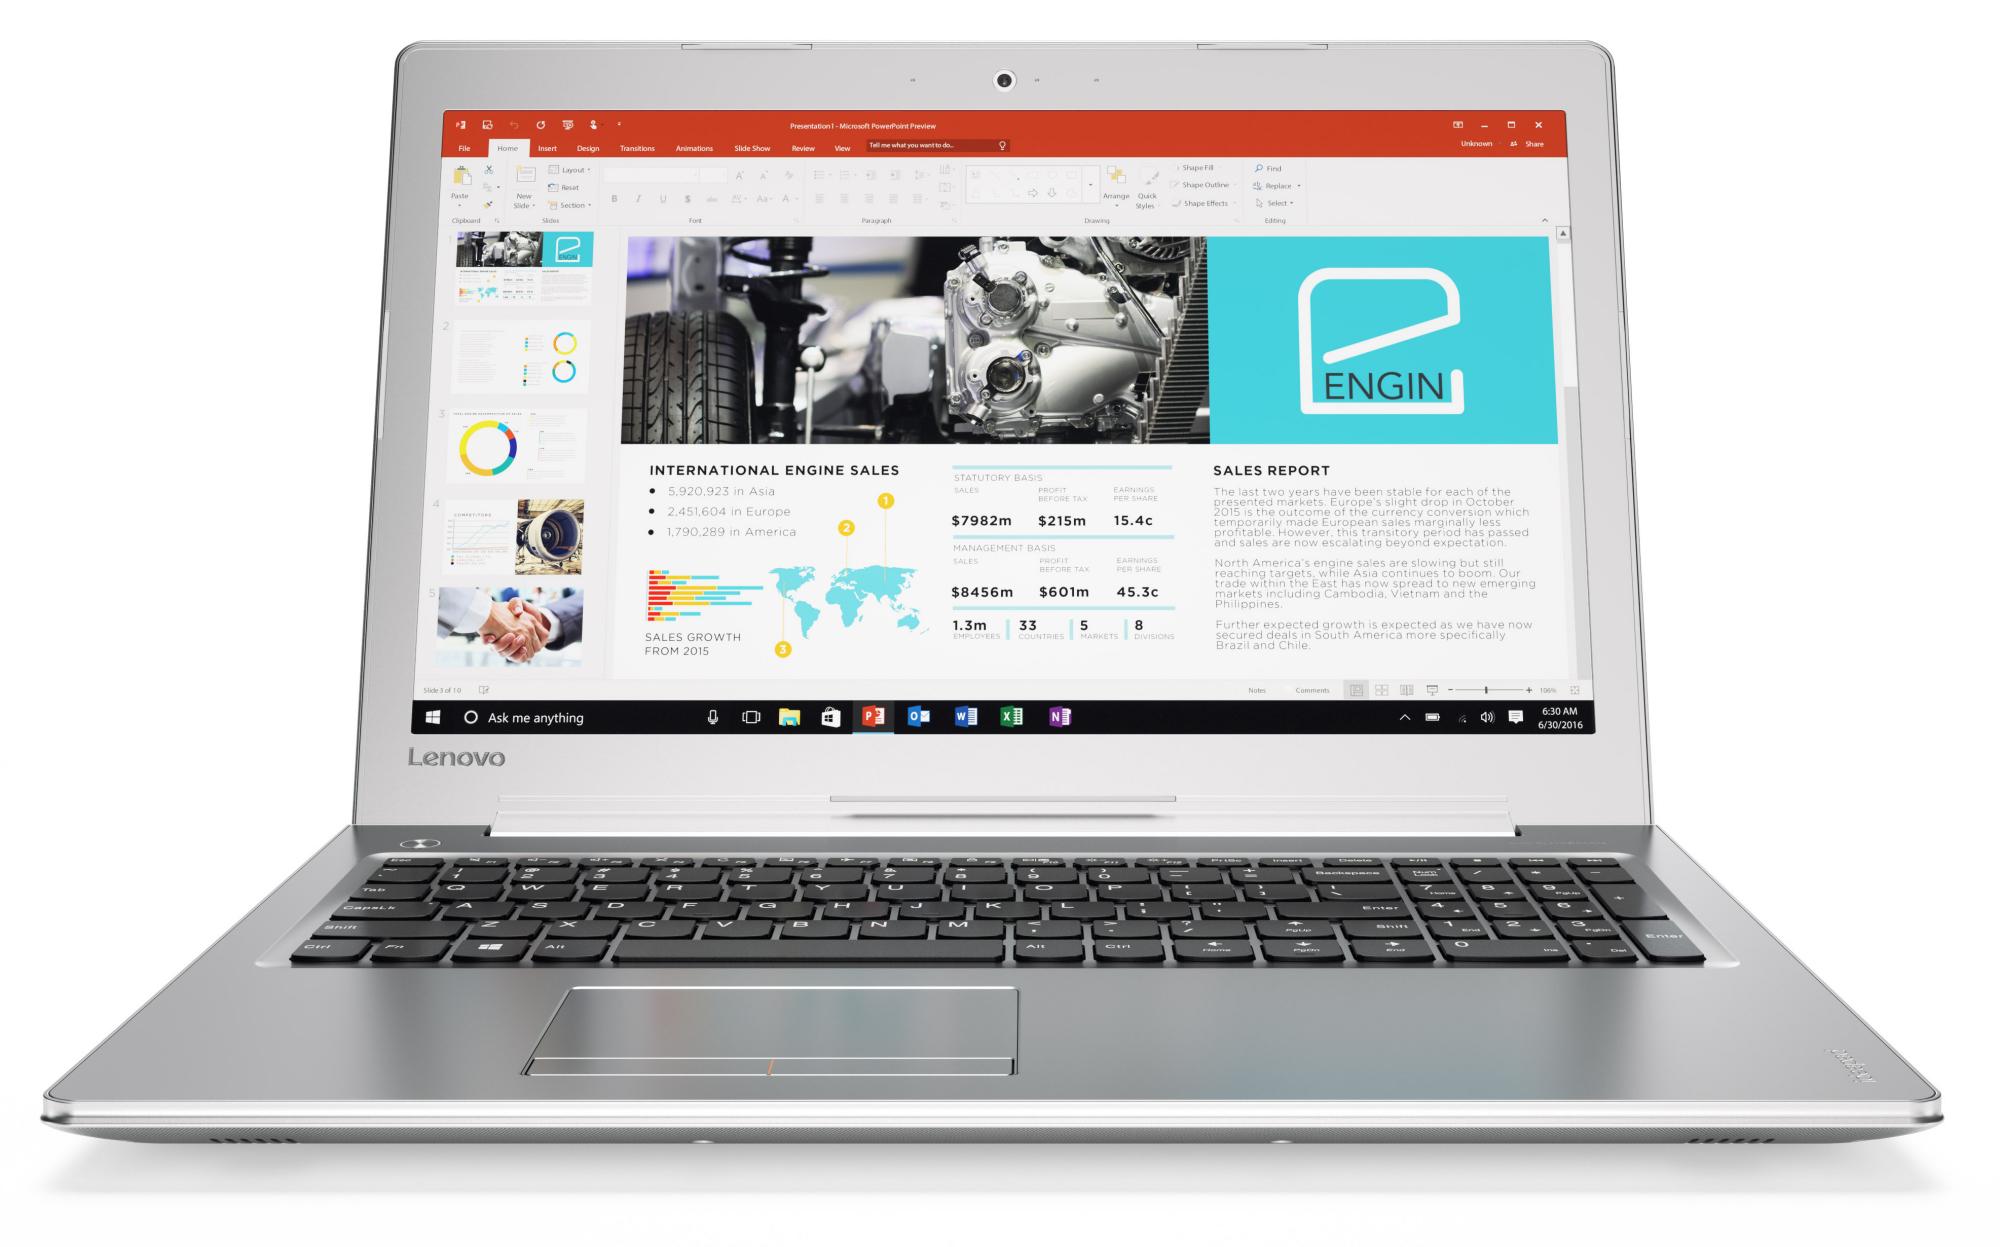 Lenovo IdeaPad 510-15IKB Notebook Review - NotebookCheck net